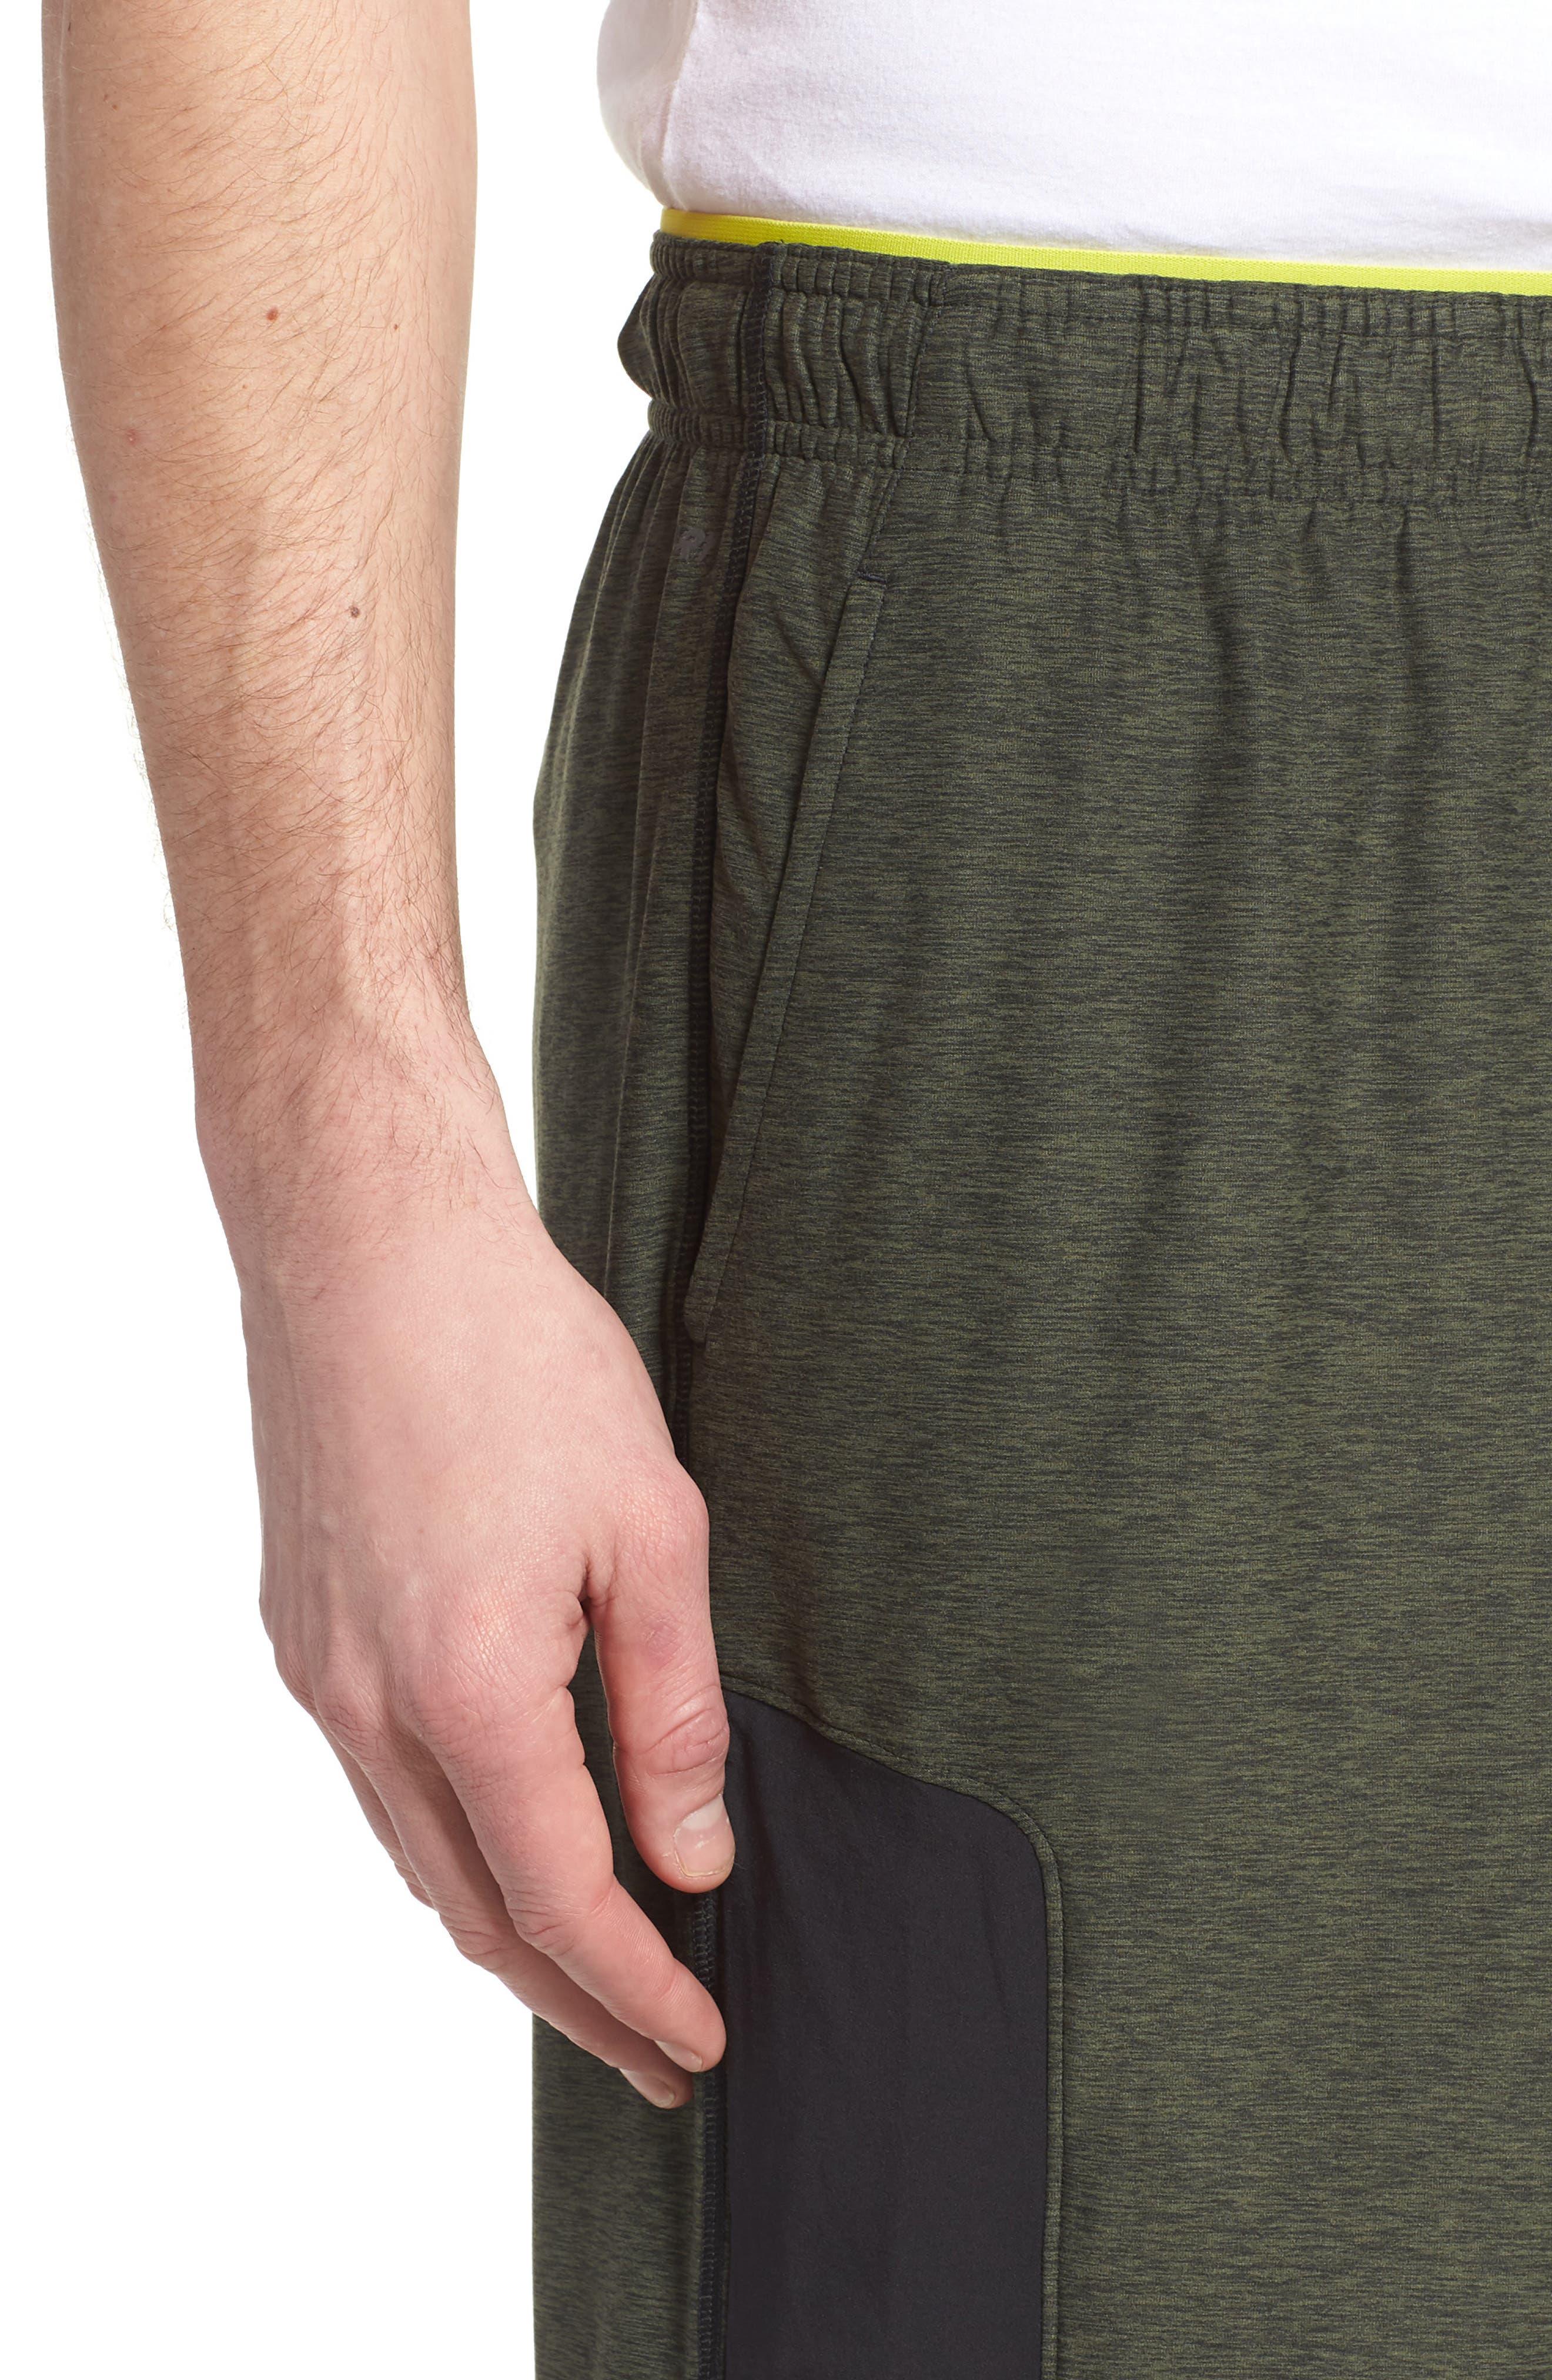 Anticipate Shorts,                             Alternate thumbnail 4, color,                             Dark Covert Green